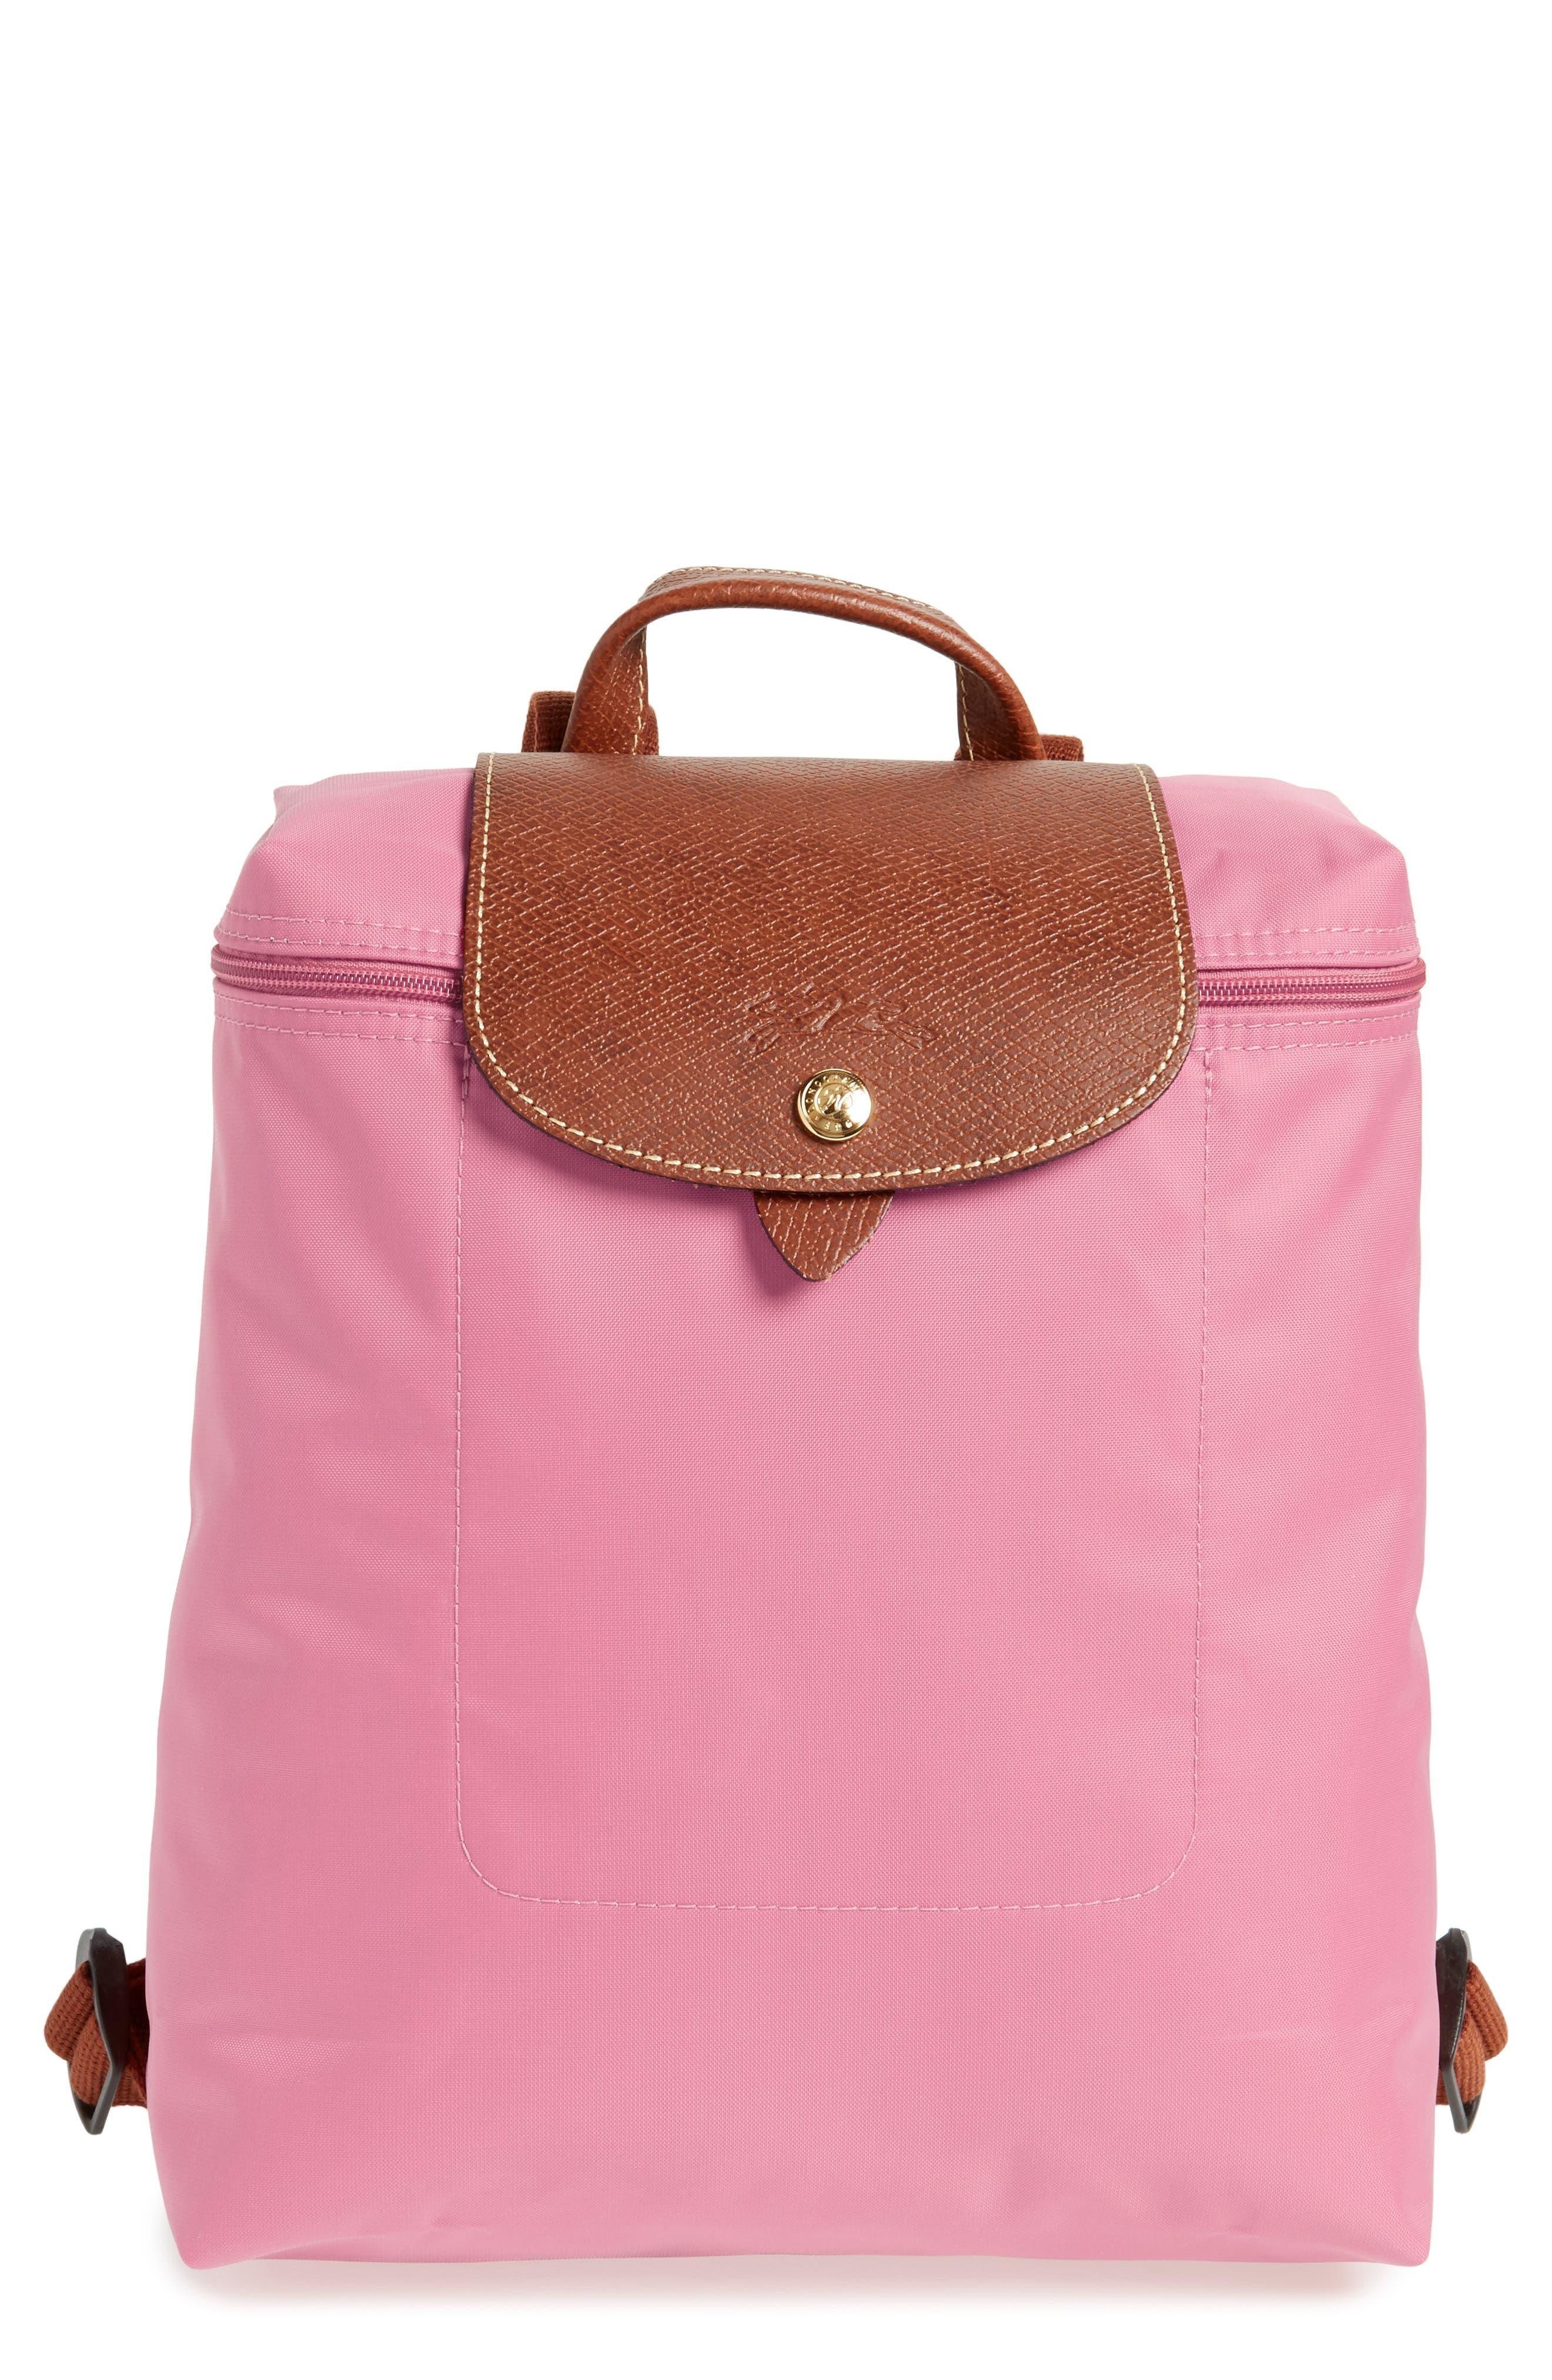 Longchamp \u0027Le Pliage\u0027 Backpack